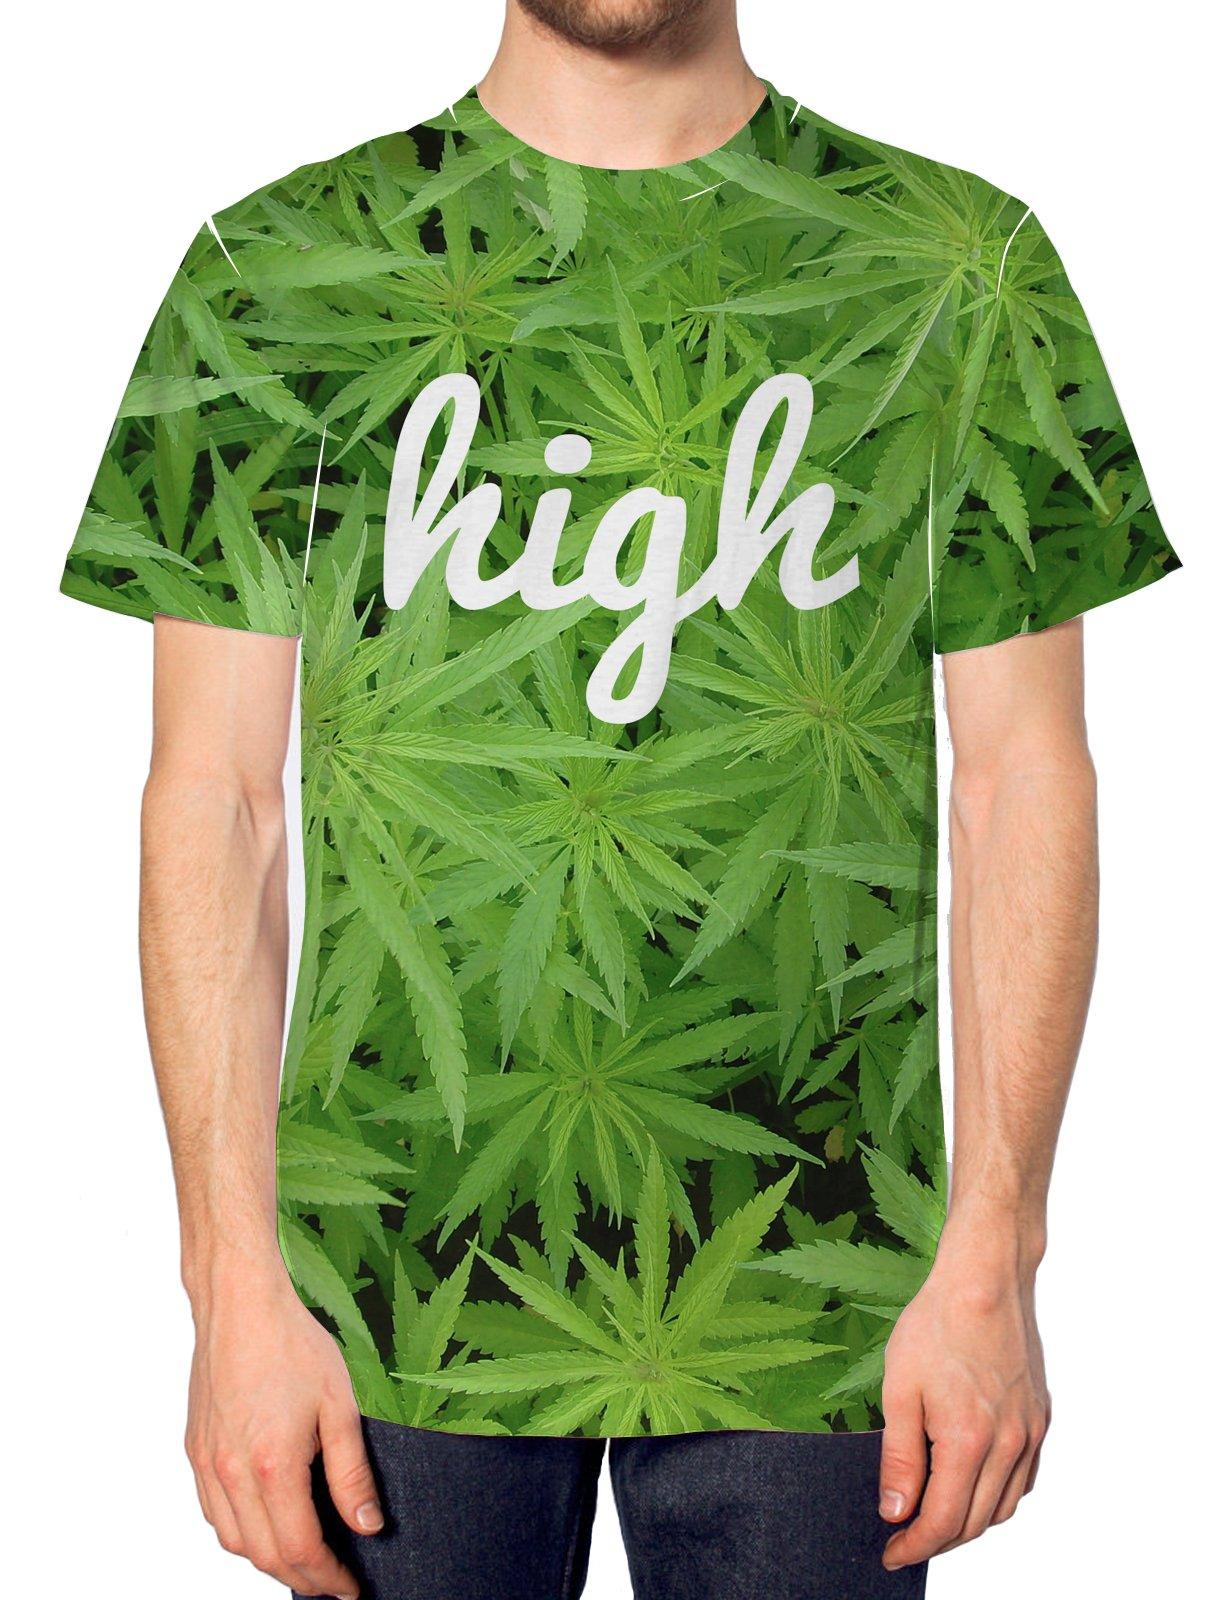 Inct Men's High Cannabis All Over Print Marijuana Weed Drugs T-Shirt